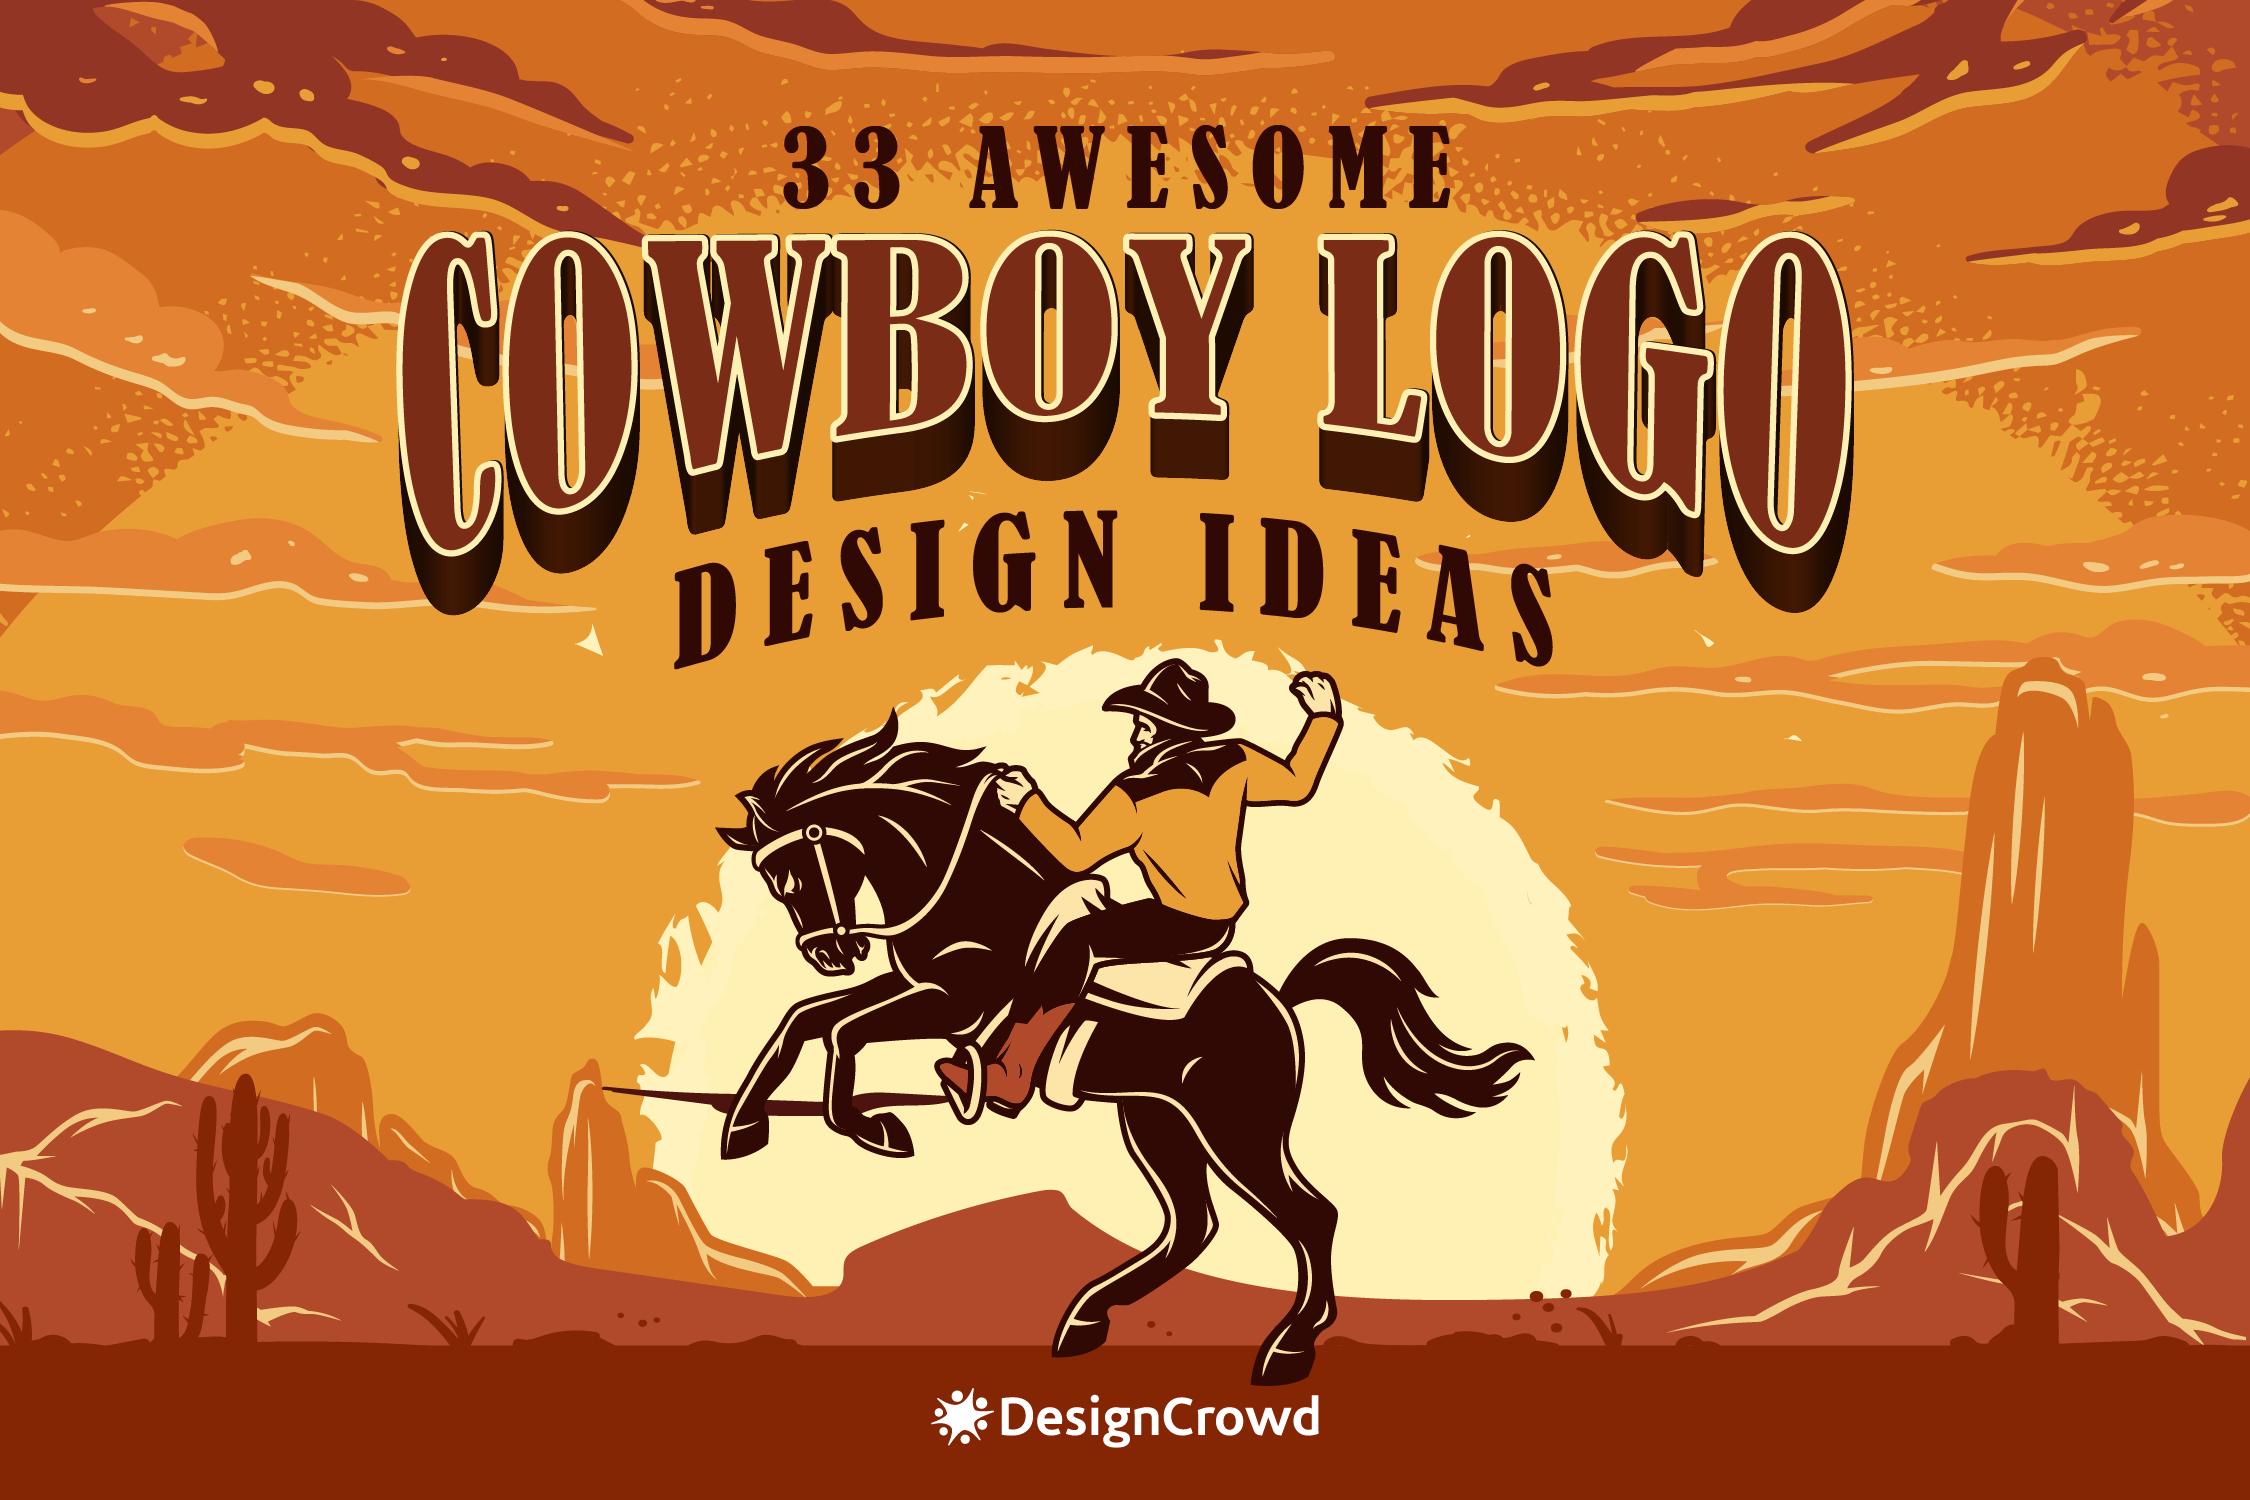 33 Awesome Cowboy Logo Design Ideas